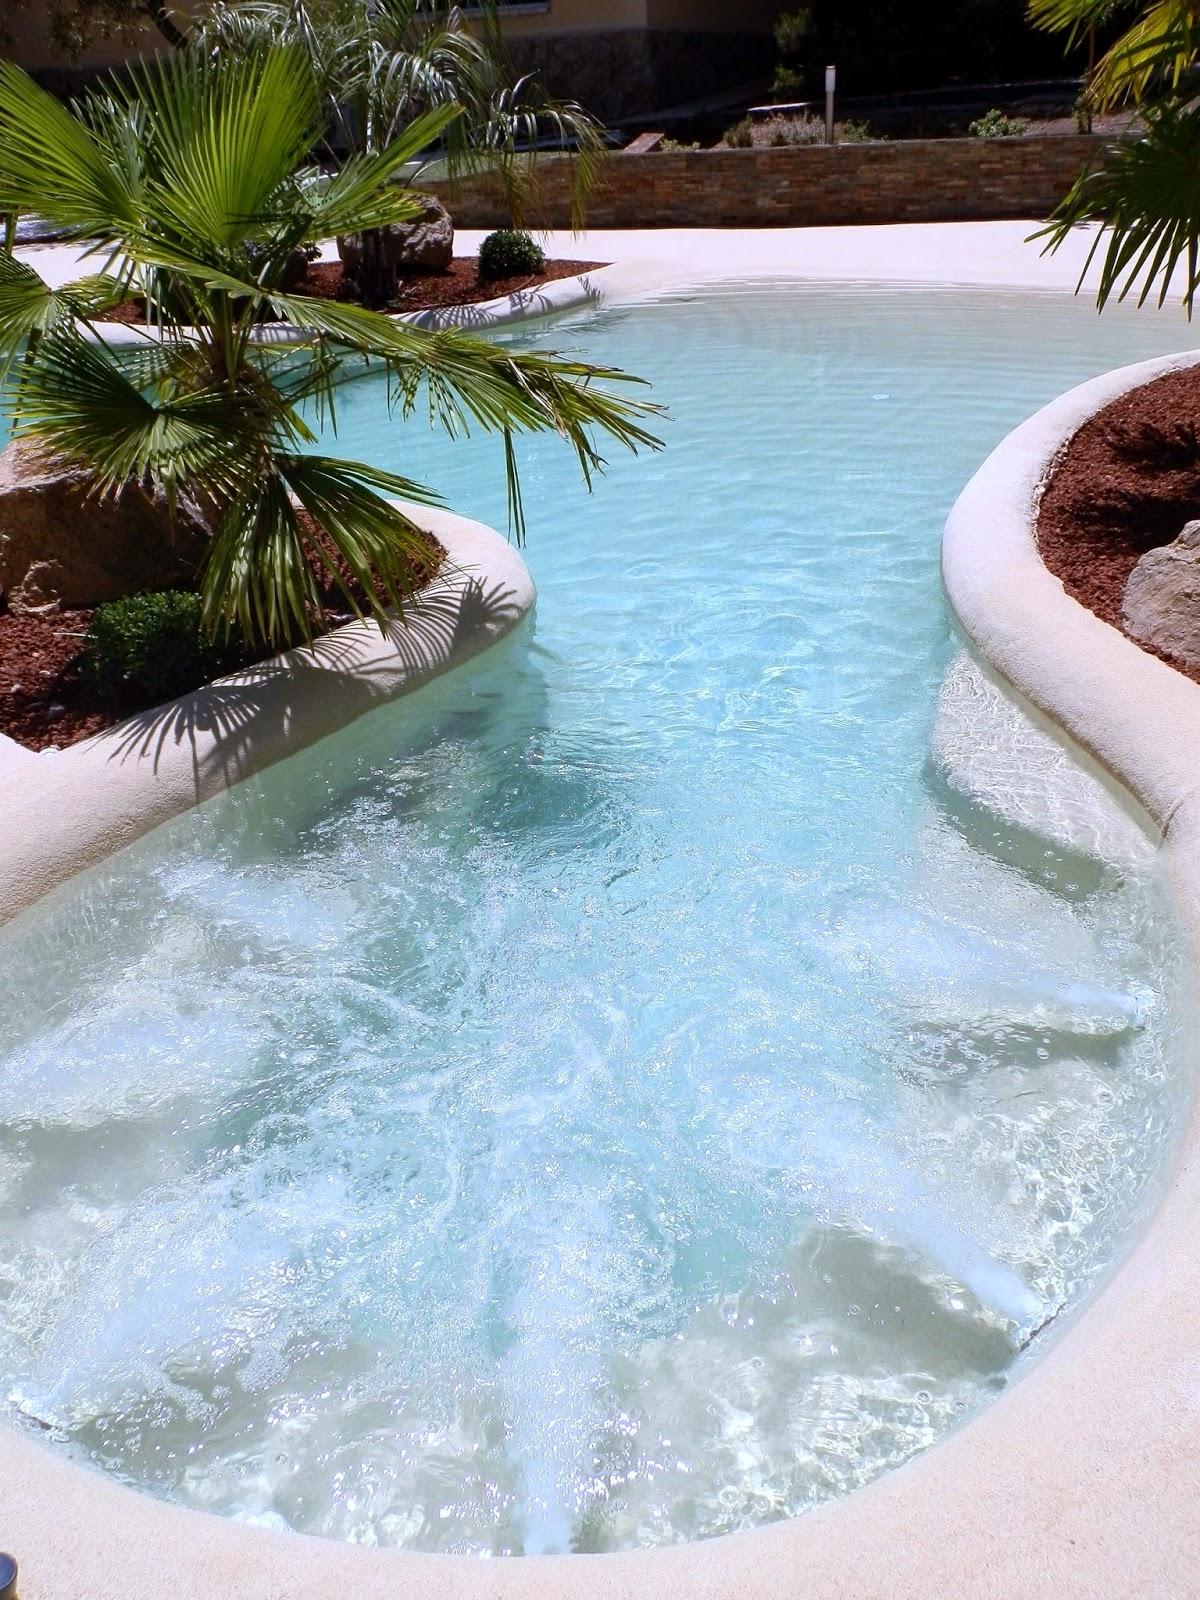 Mode amplitude fashion culture piscinas de arena - Piscina de arena ...